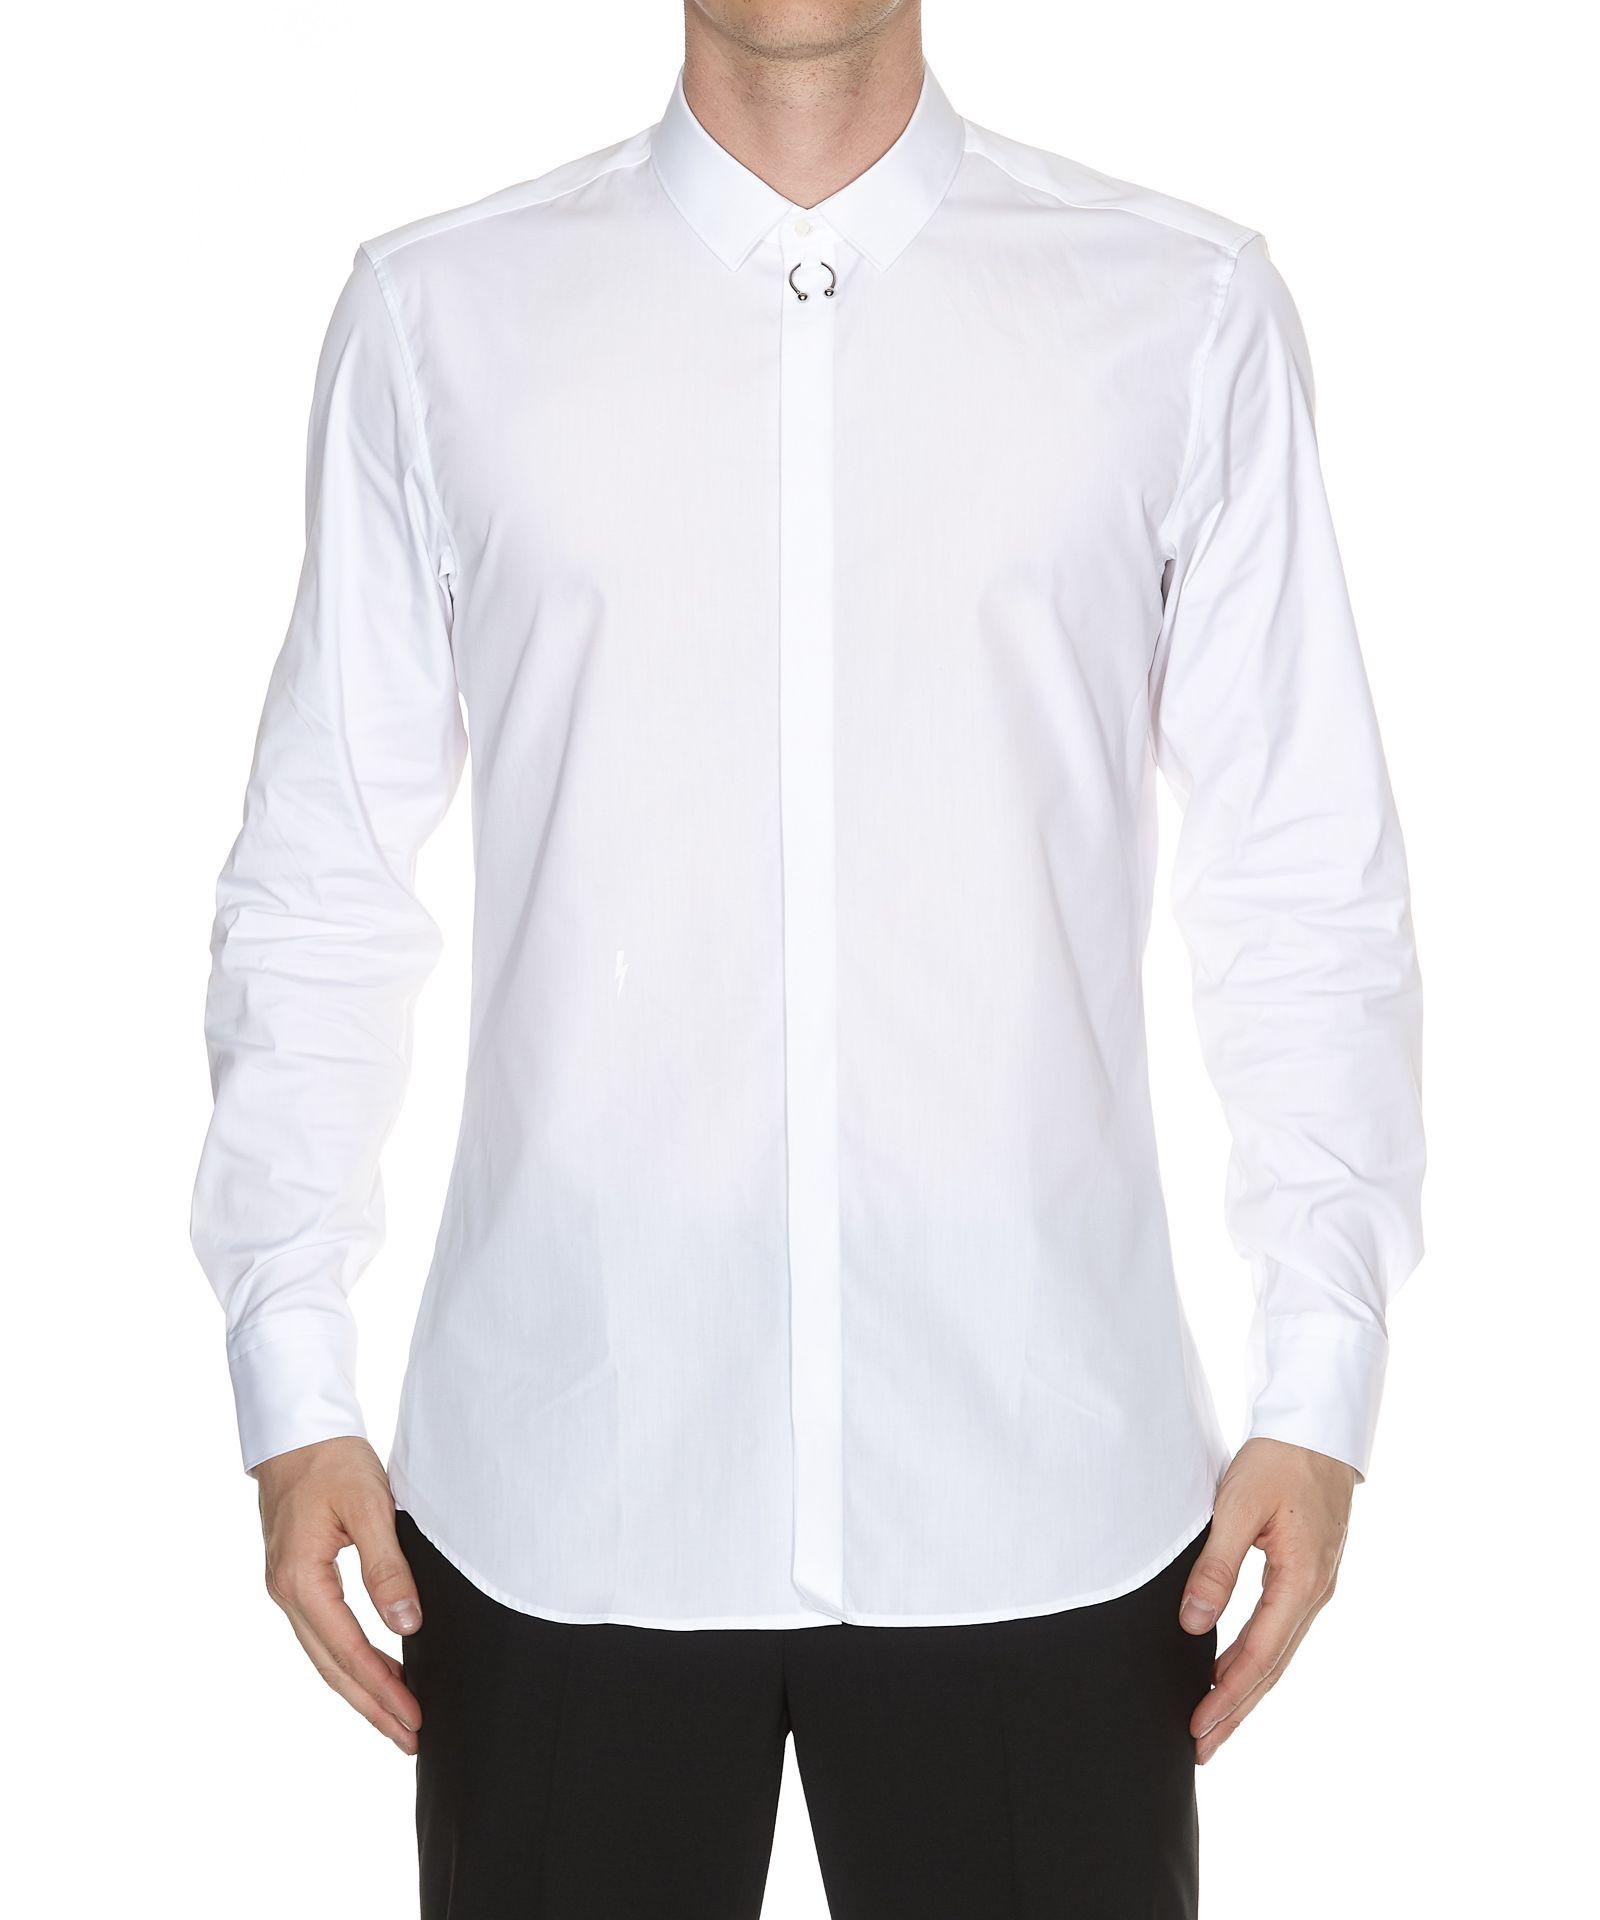 Low Price Fee Shipping Hot Sale Cheap Price piercing shirt - White Neil Barrett IZoFdmBcU